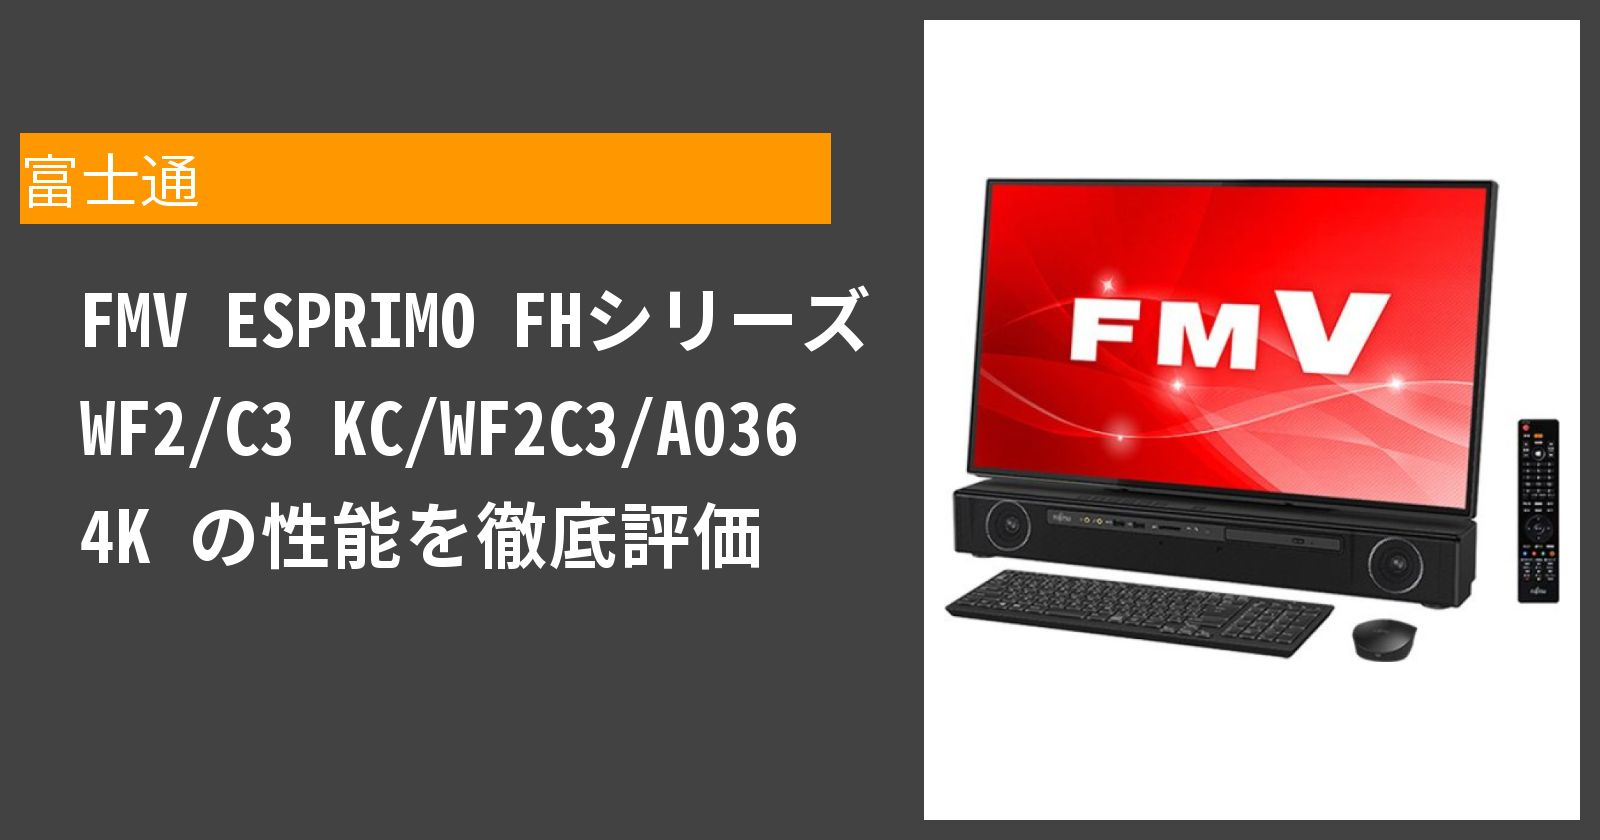 FMV ESPRIMO FHシリーズ WF2/C3 KC/WF2C3/A036 4K の性能を徹底評価